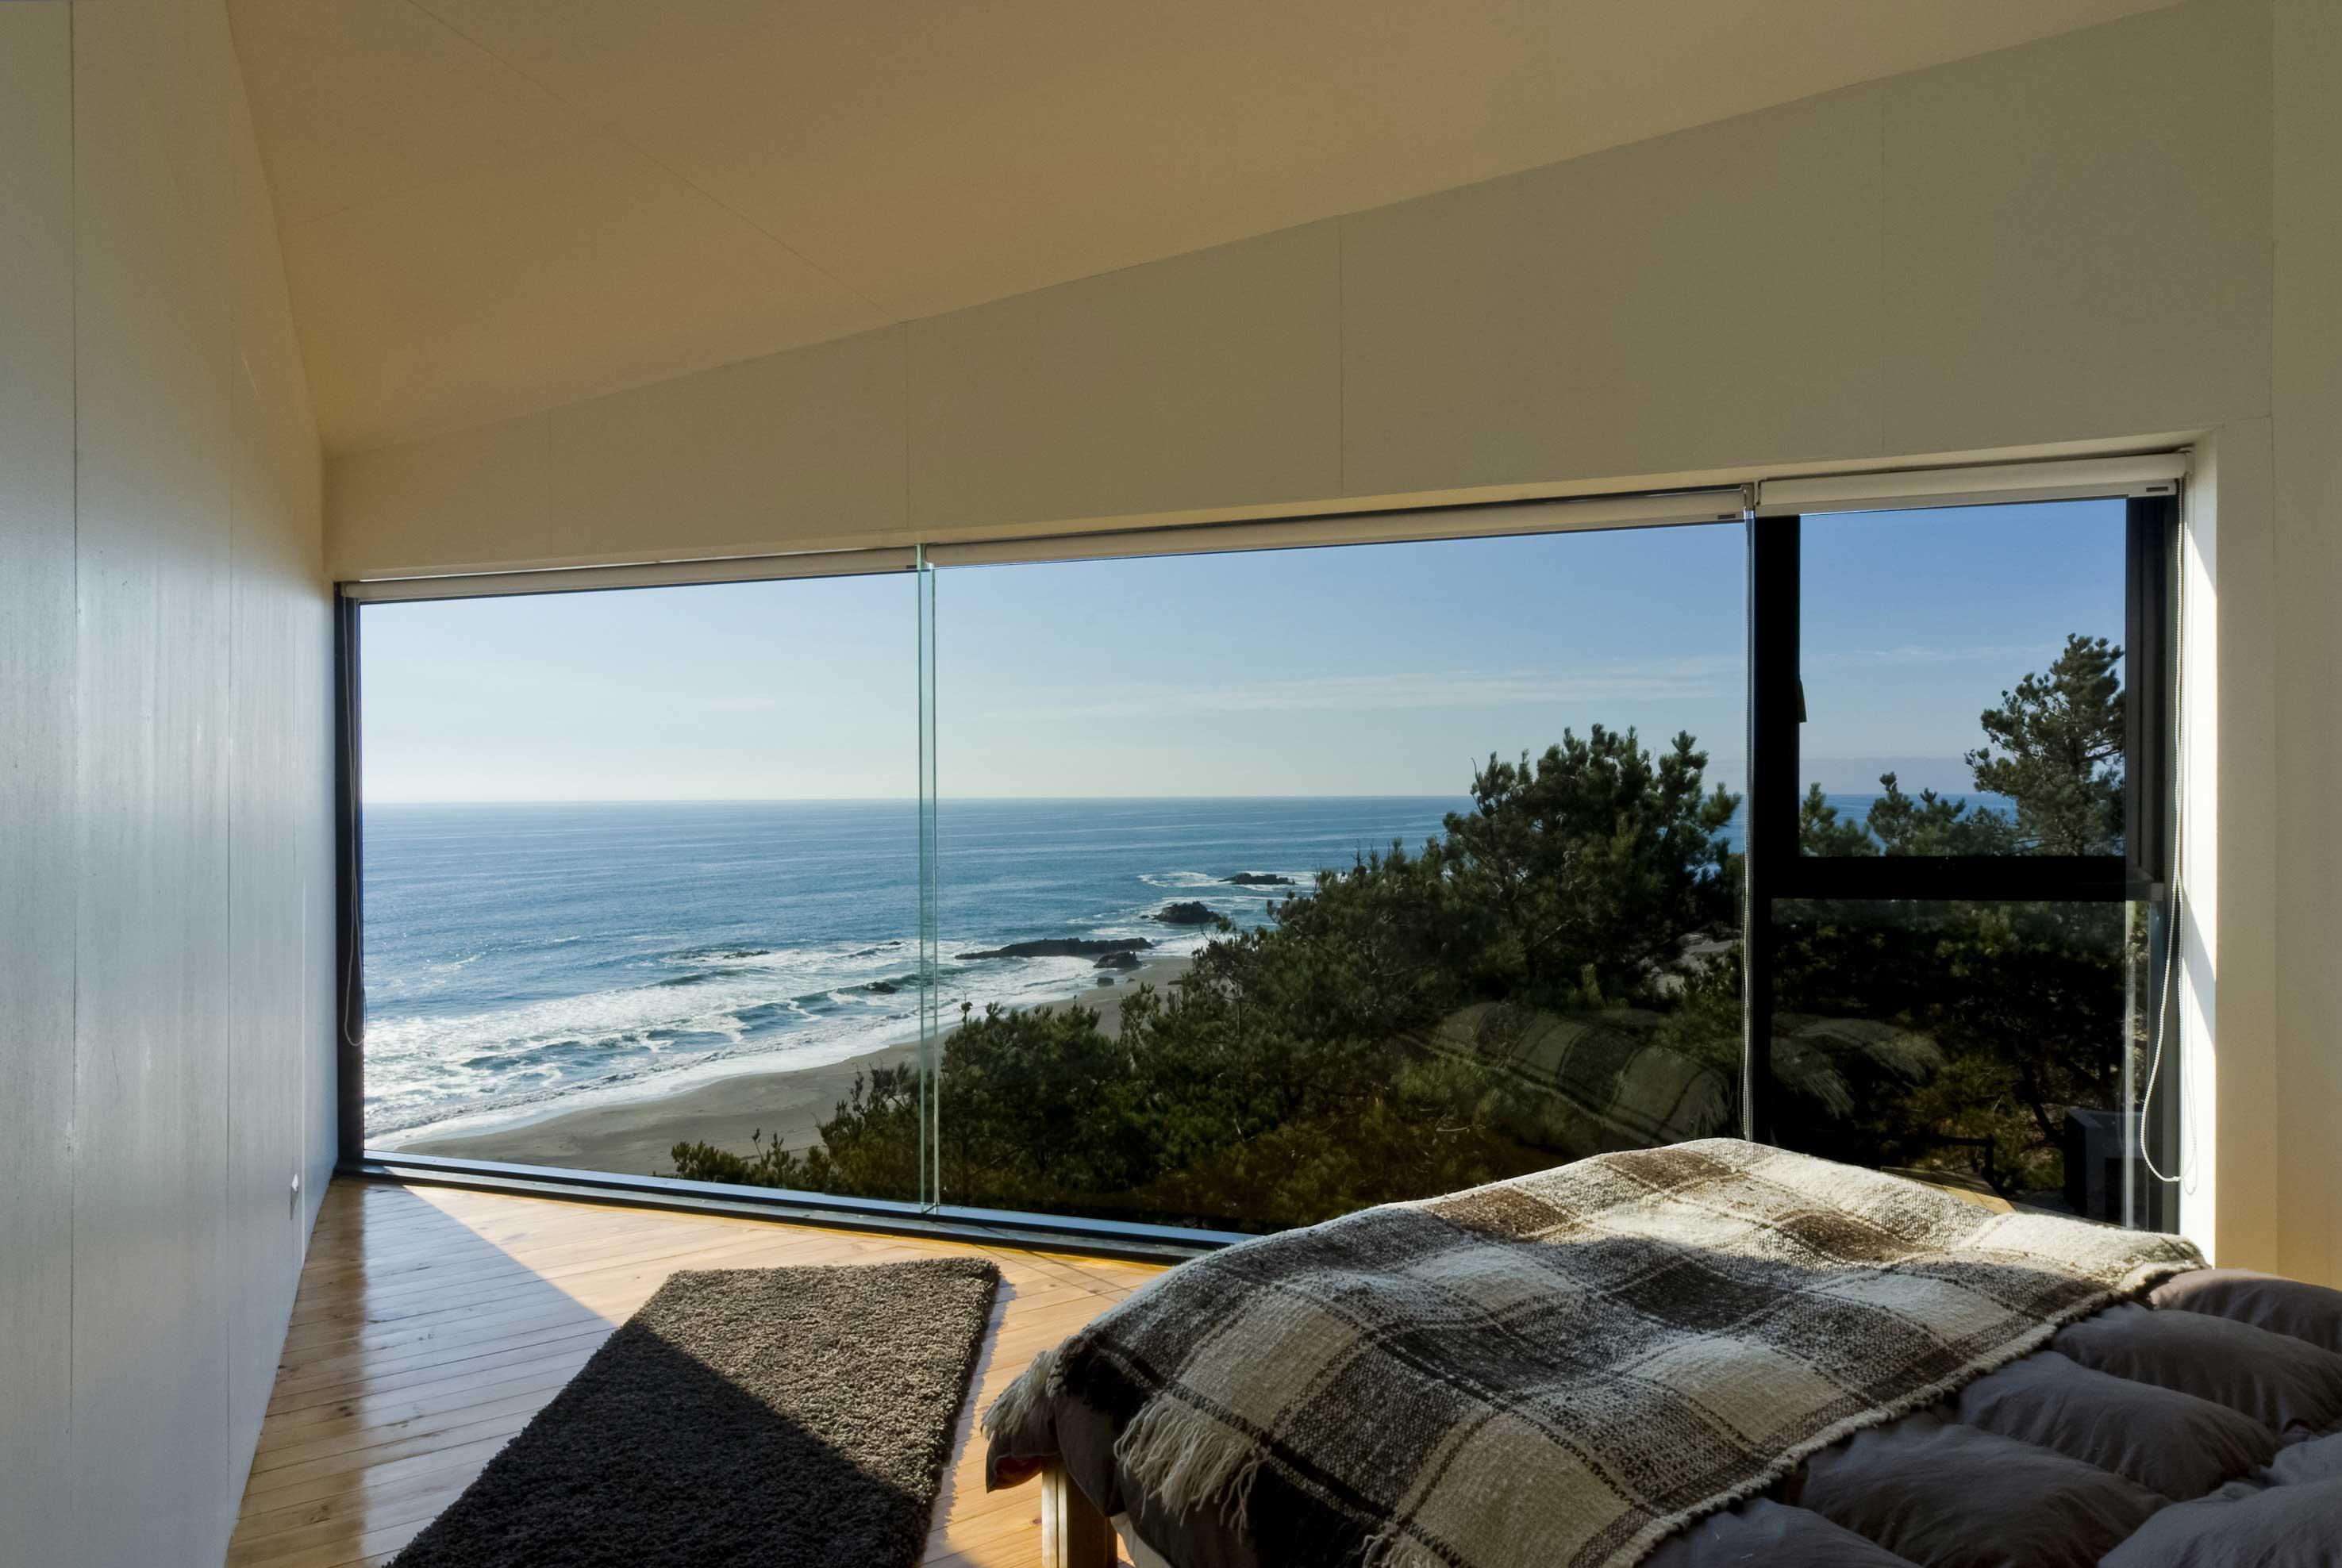 xBedroom-Panoramic-Glass-Wall-Ideas-8.jpg.pagespeed.ic.Ebbi4vaicJ